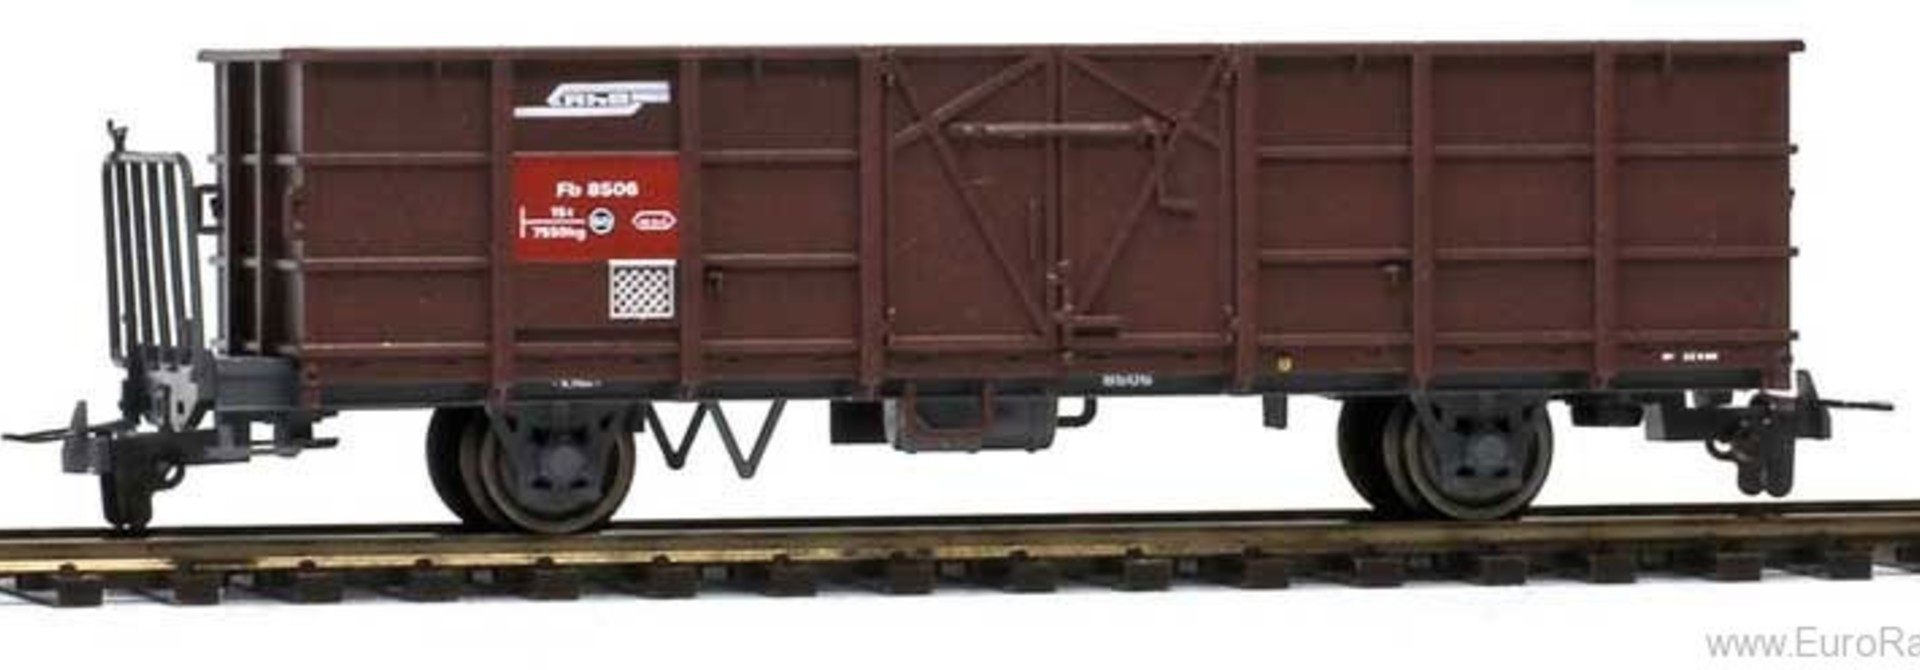 2255116 RhB Fb 8506 Hochbordwagen braun